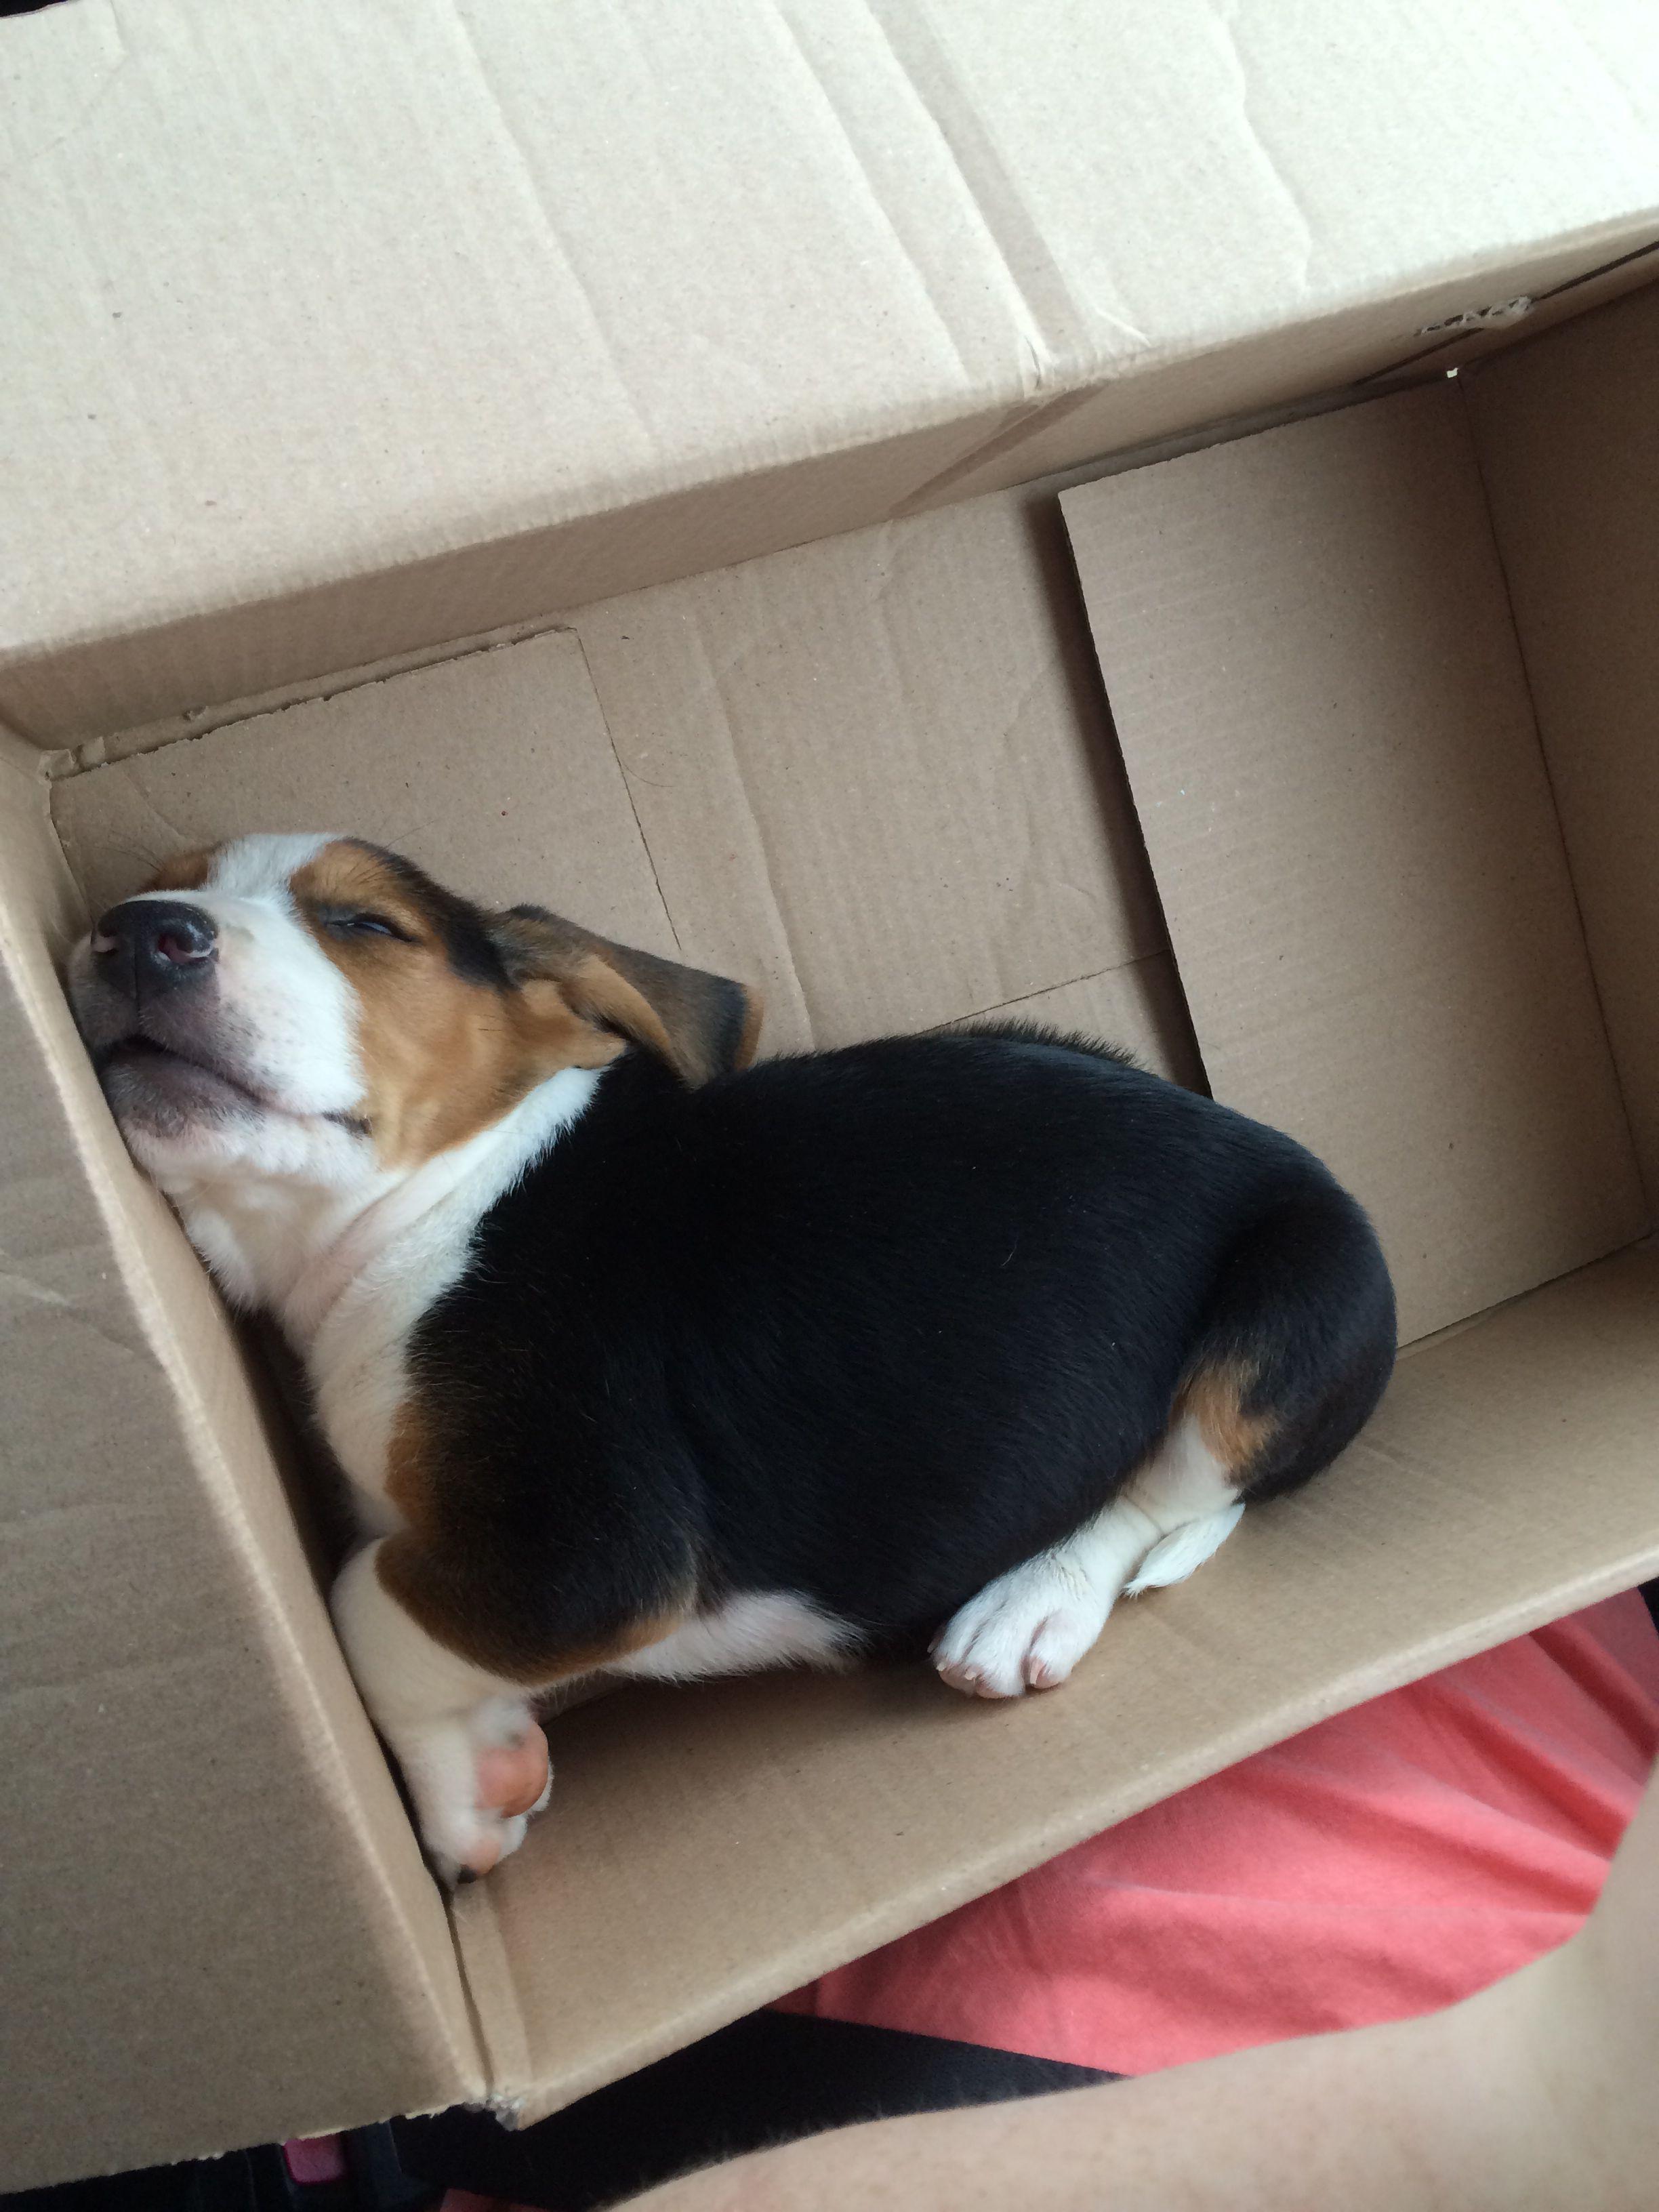 Everyone needs a beagle in a box ❤️